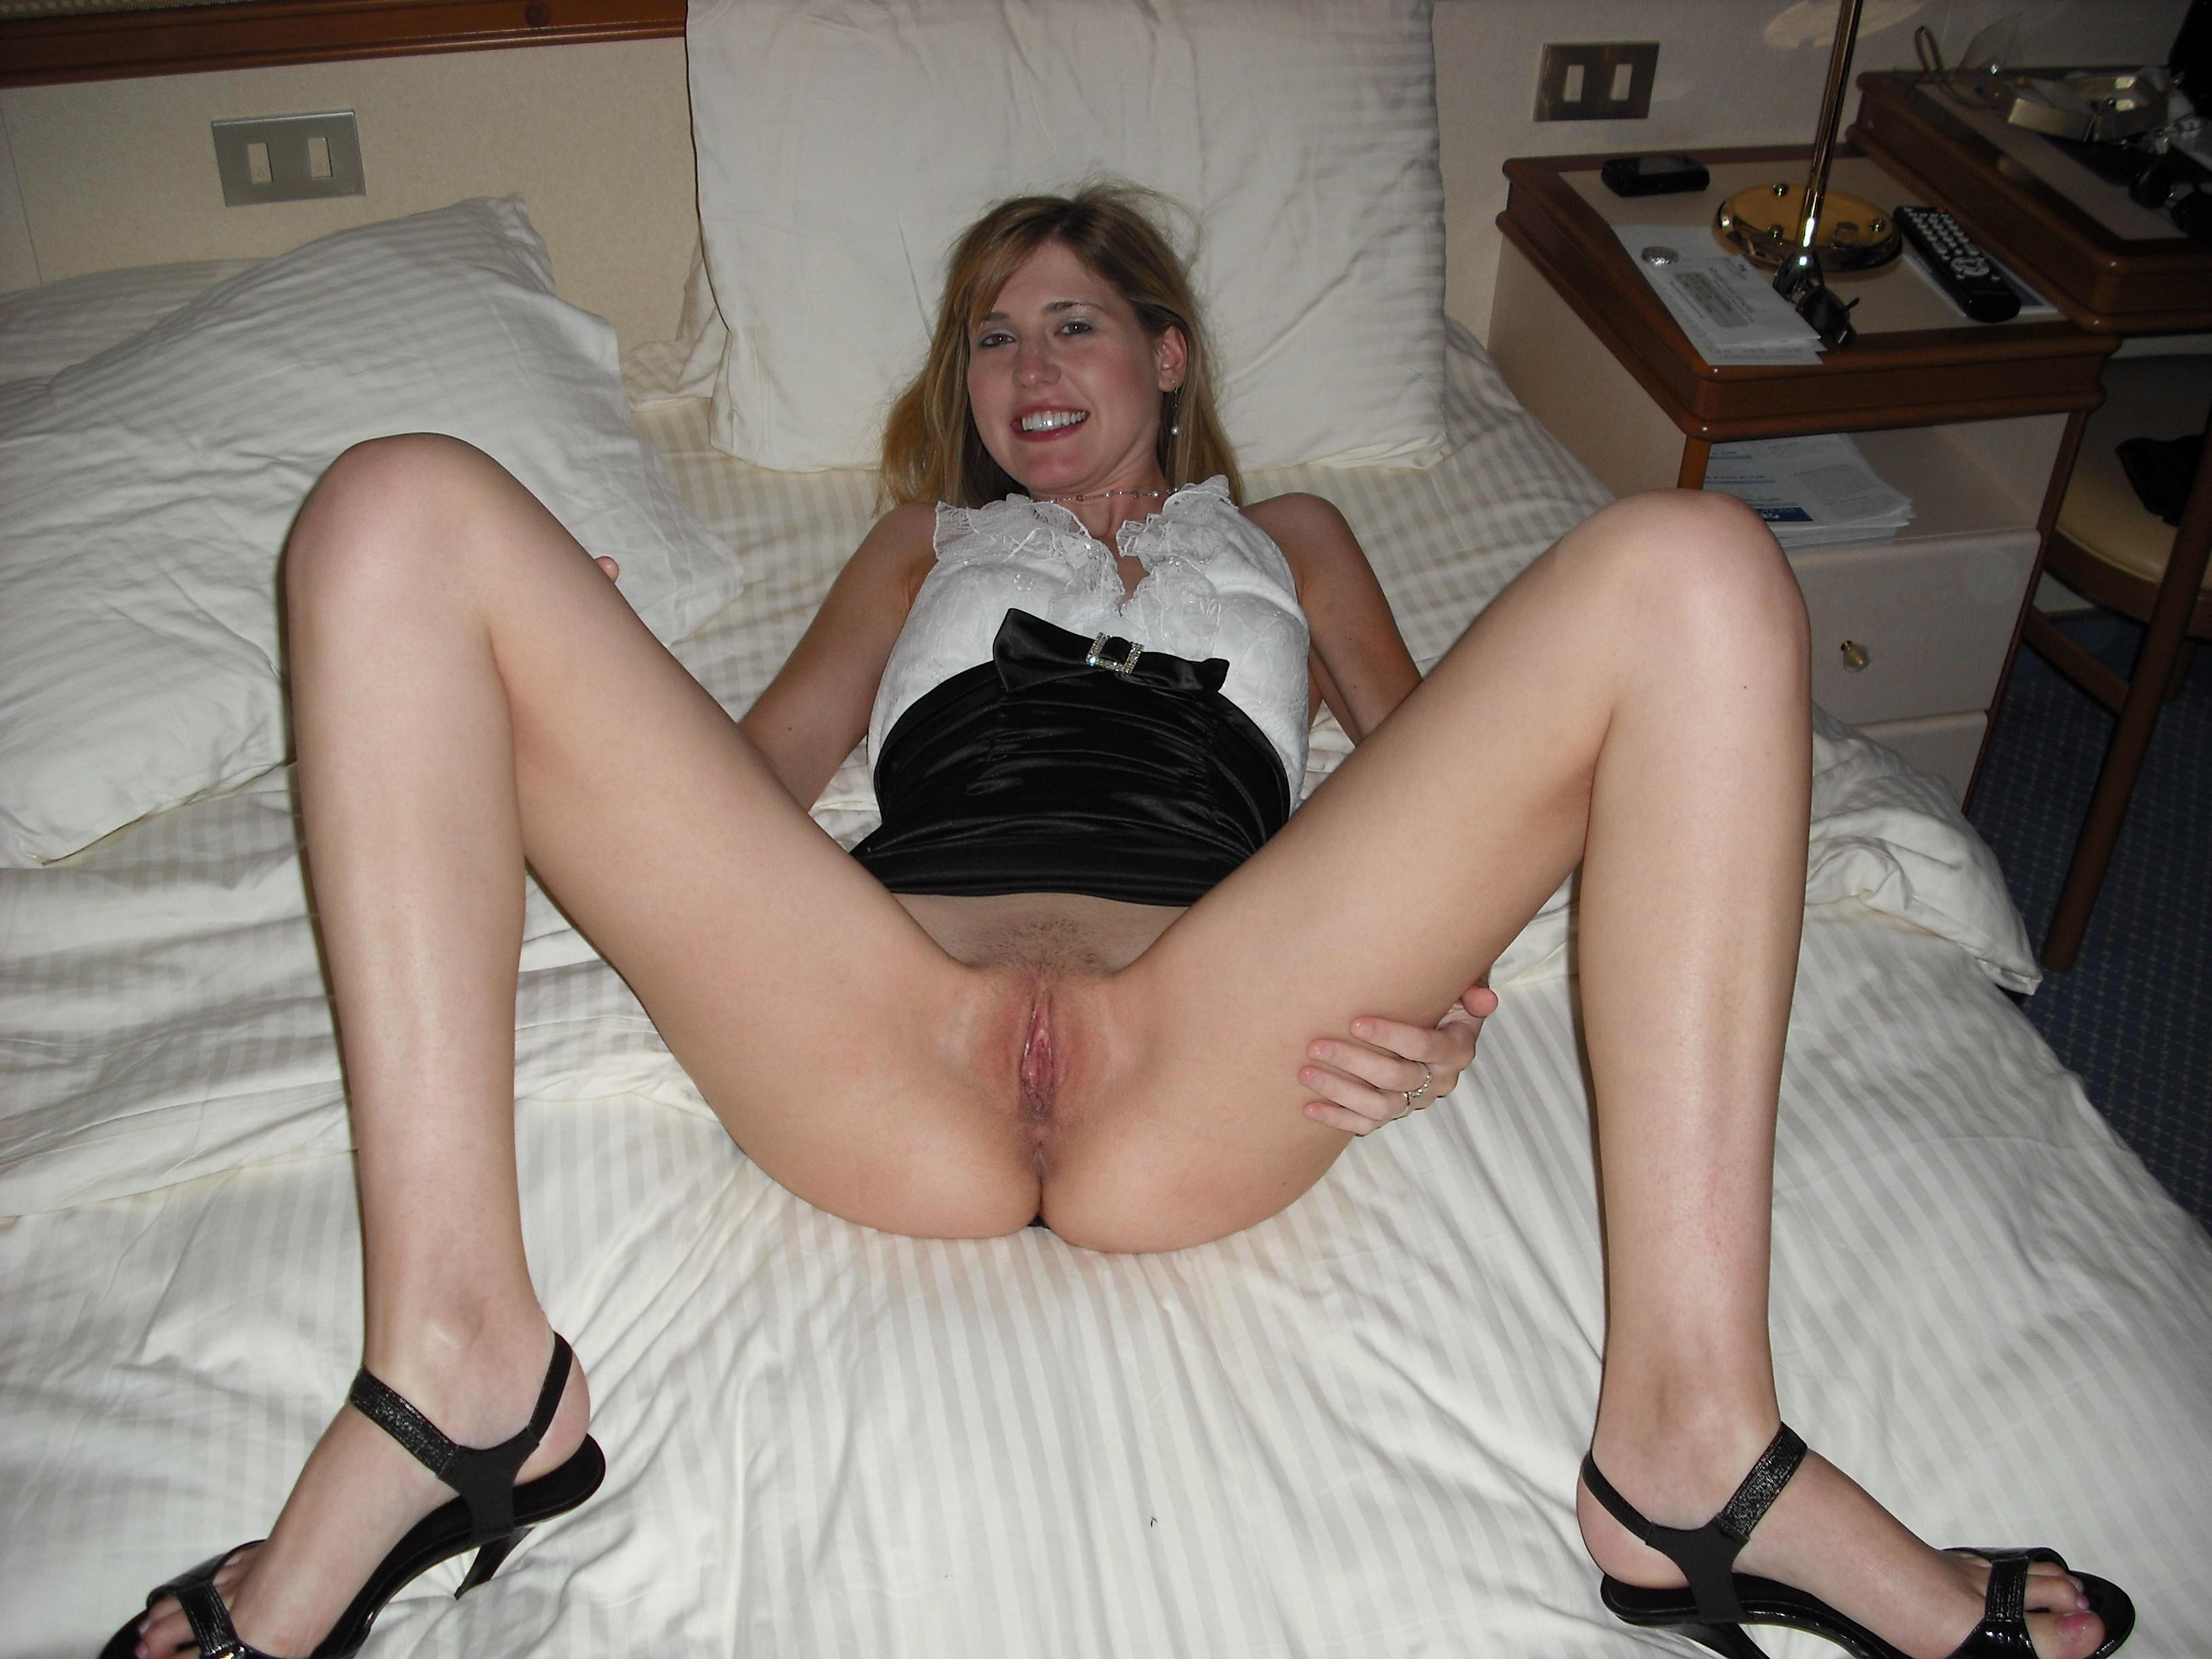 Young slut girls nude legs